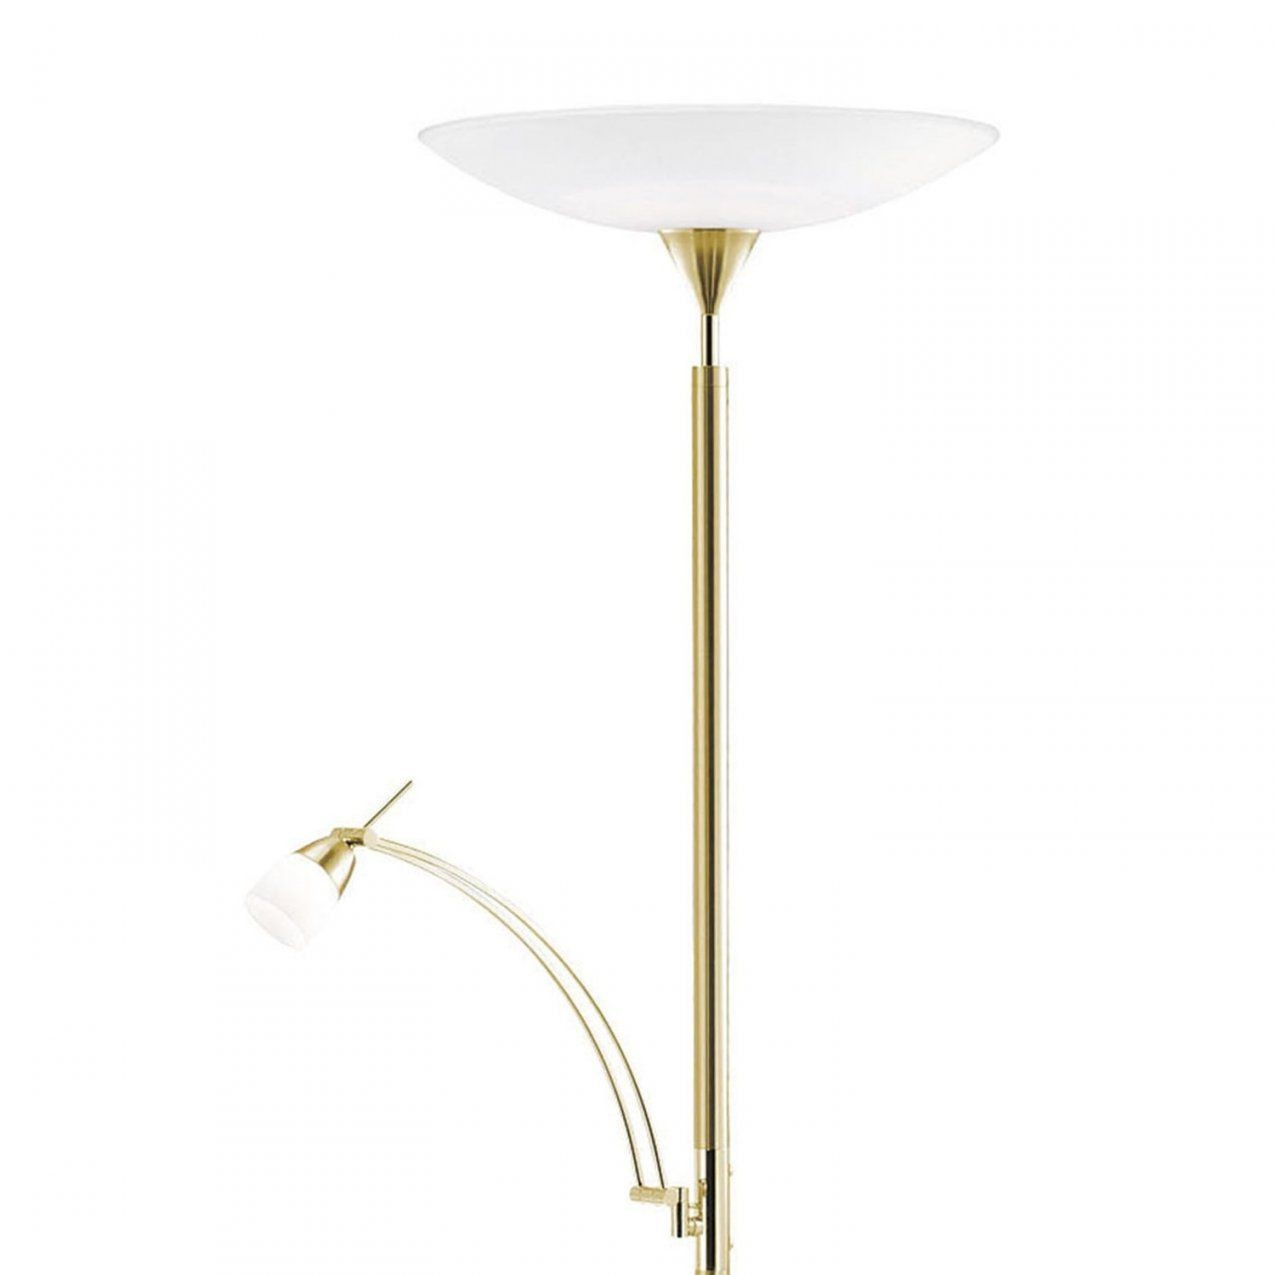 Paul Neuhaus Ledstehleuchte Pearl Messing Matt Eek A+ Kaufen Bei Obi von Led Stehlampe Messing Dimmbar Bild